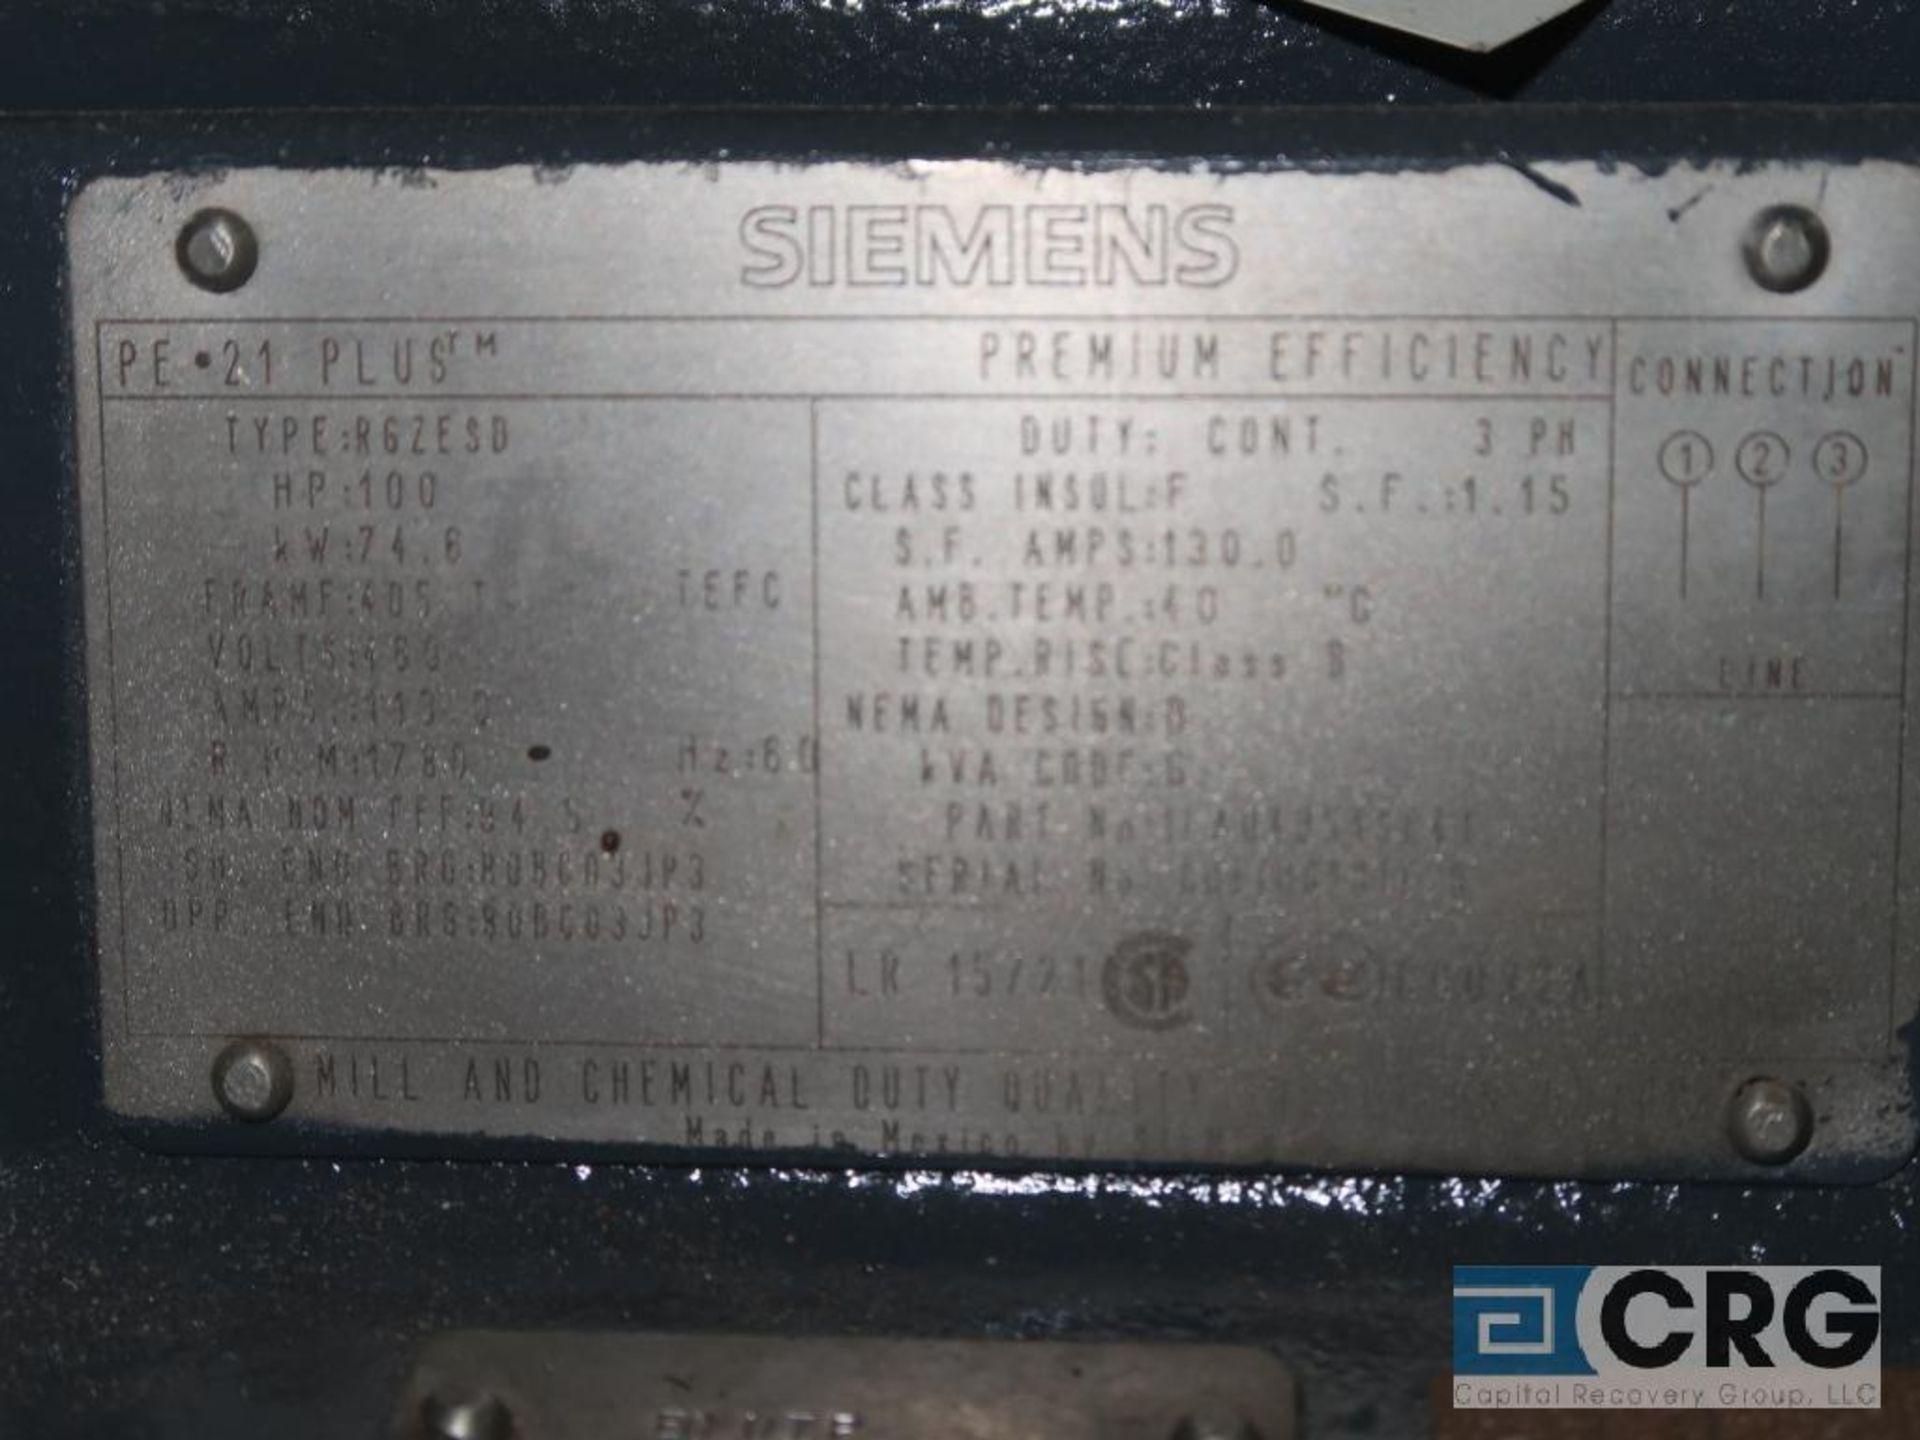 Siemens PE-21 PLUS motor, 100 HP, 1,780 RPMs, 460 volt, 3 ph., 405T frame (Finish Building) - Image 2 of 2